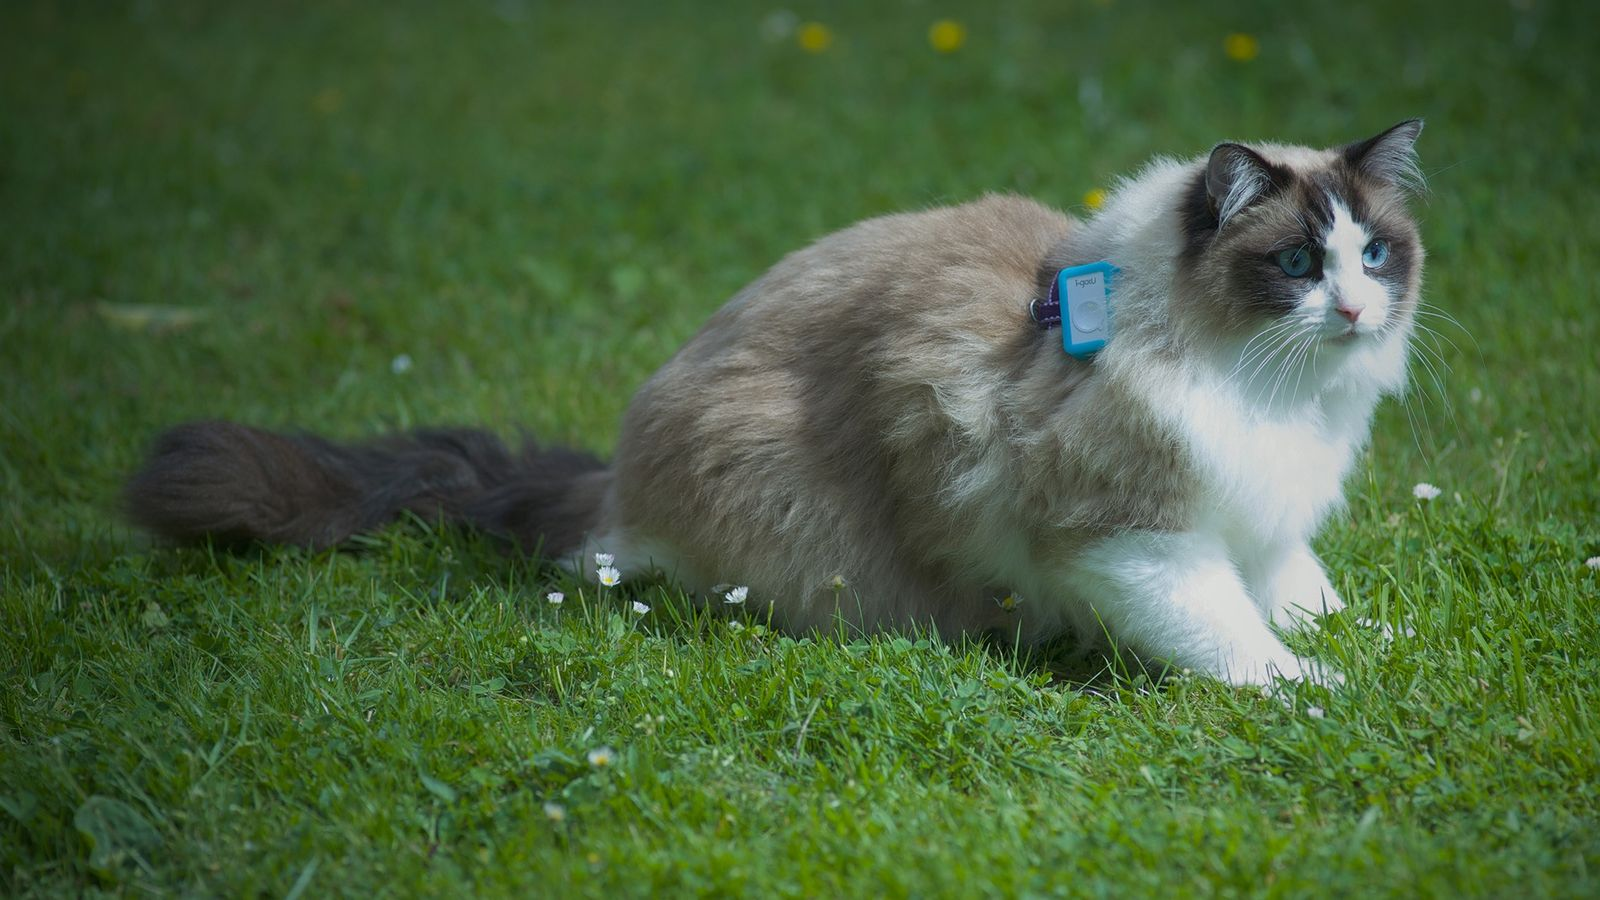 Katze mit GPS-Tracker